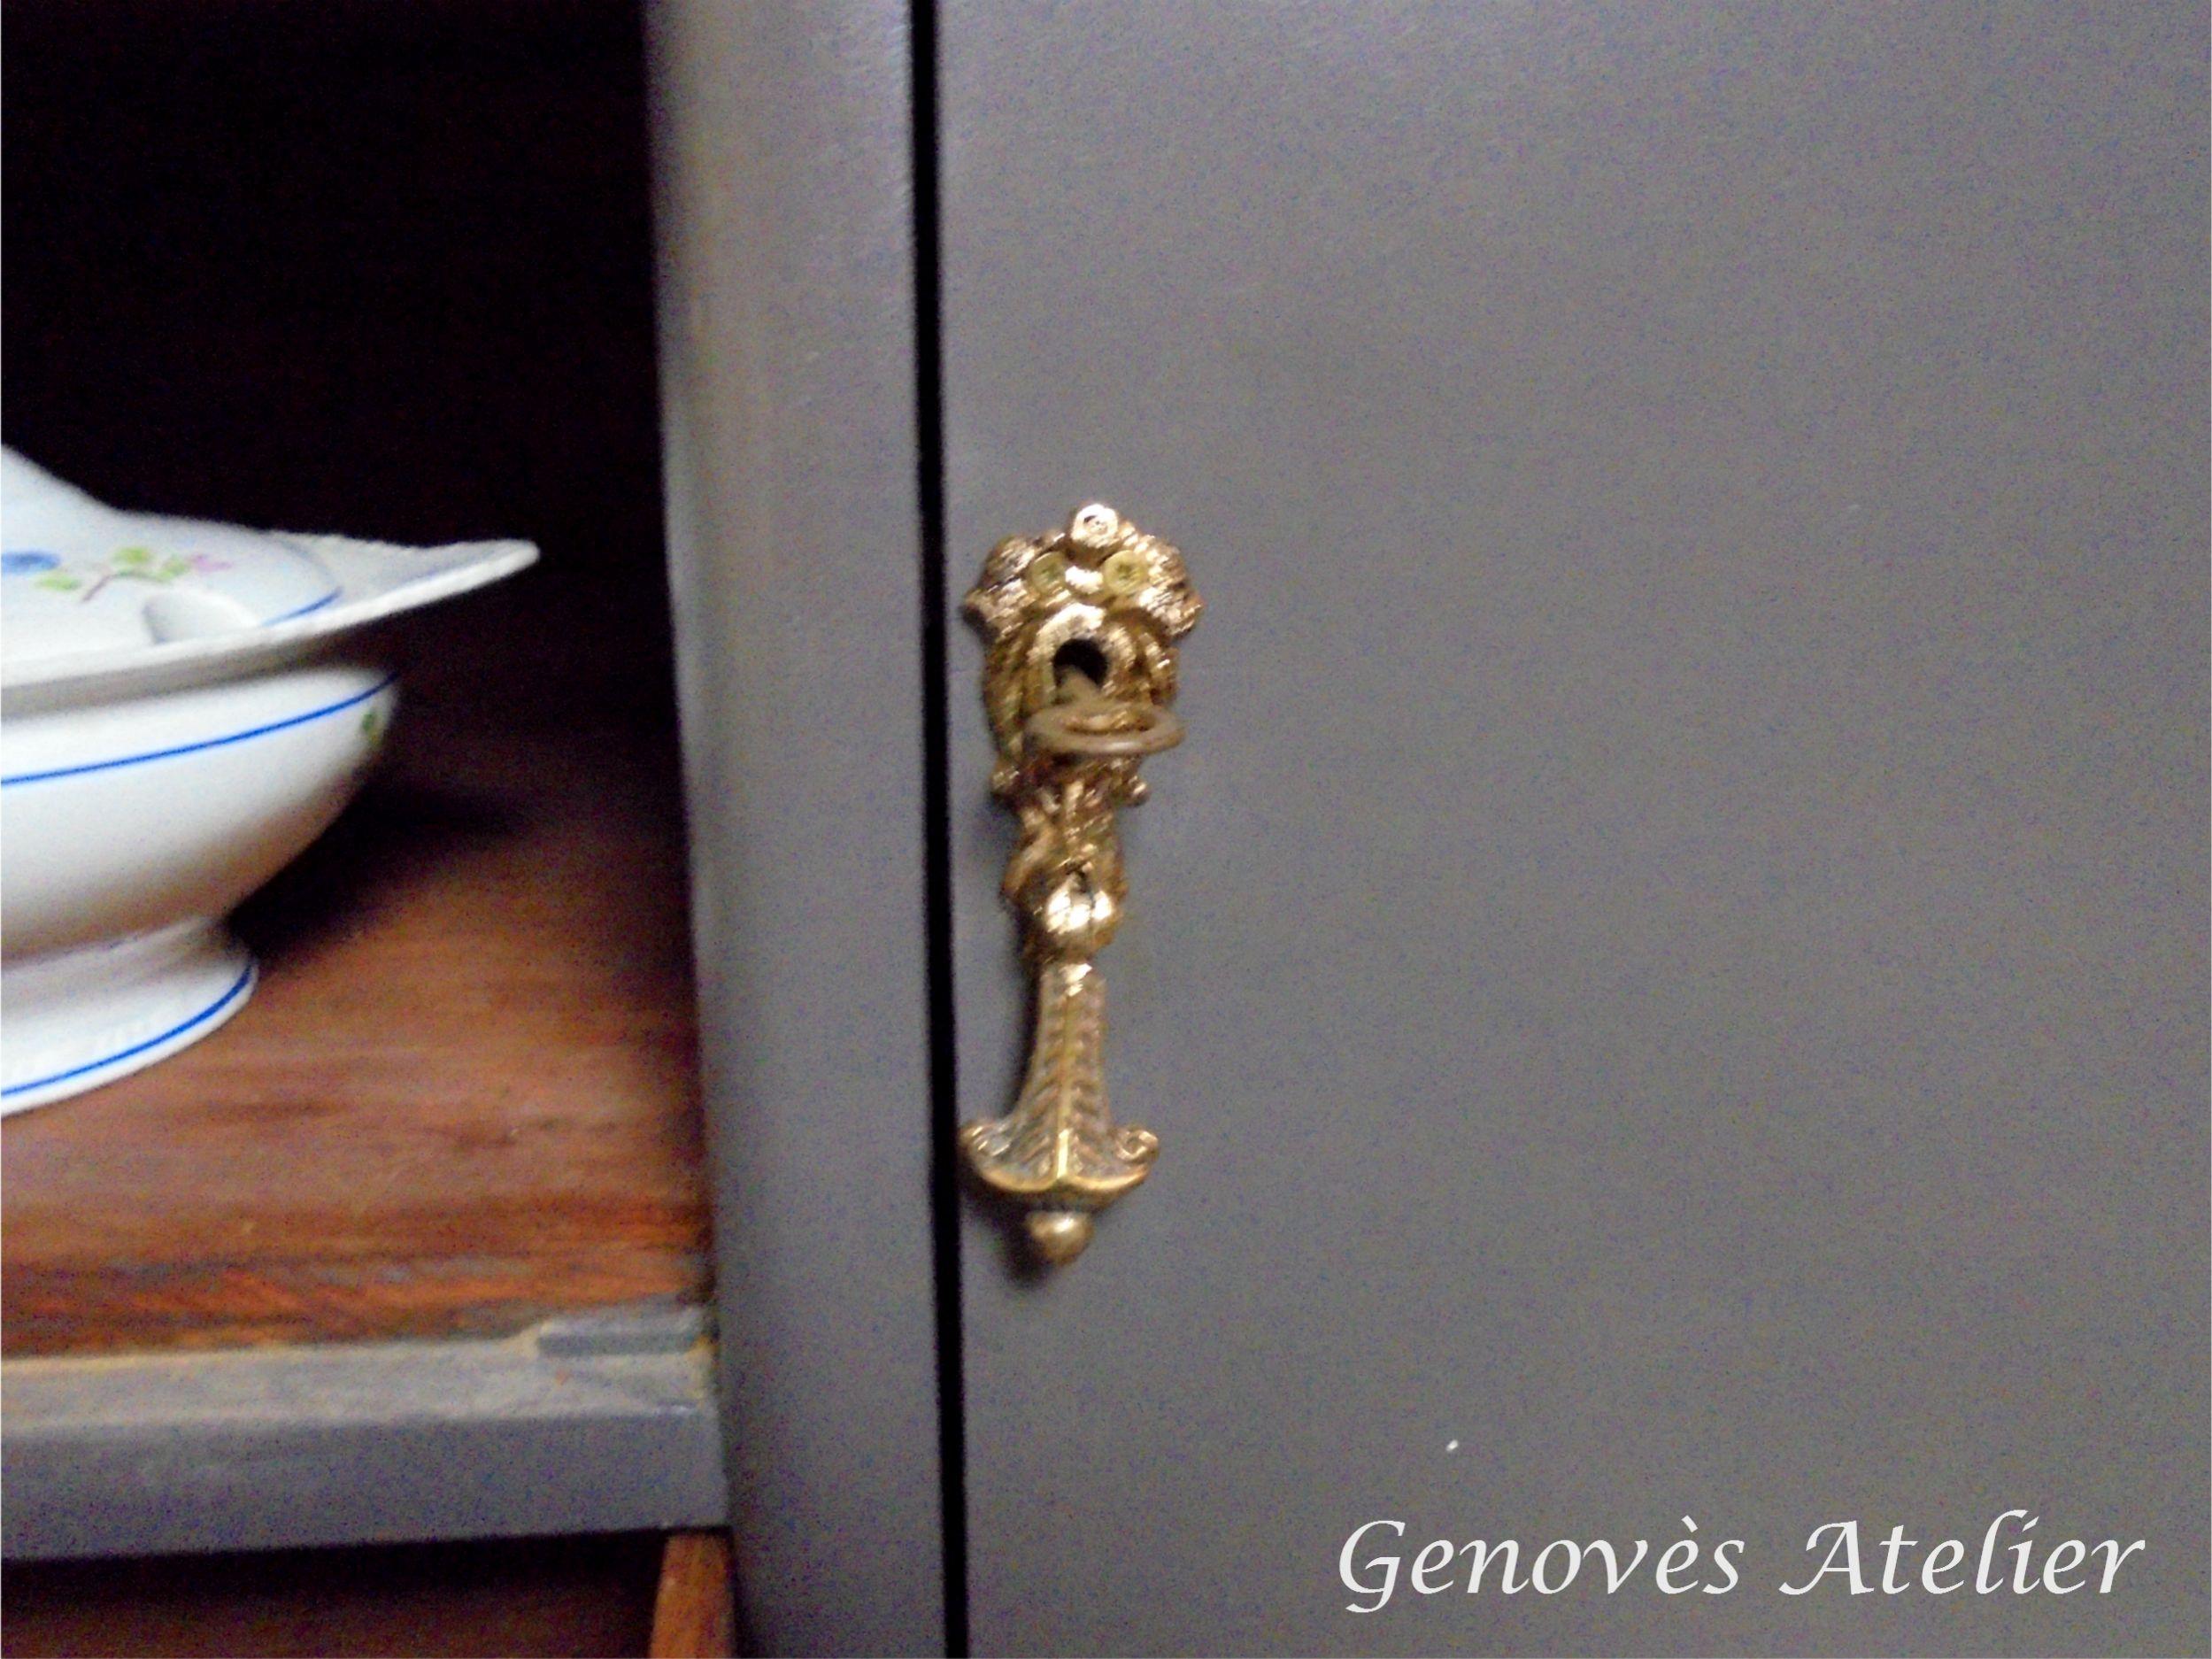 Cerradura mueble modernista Genoves Atelier